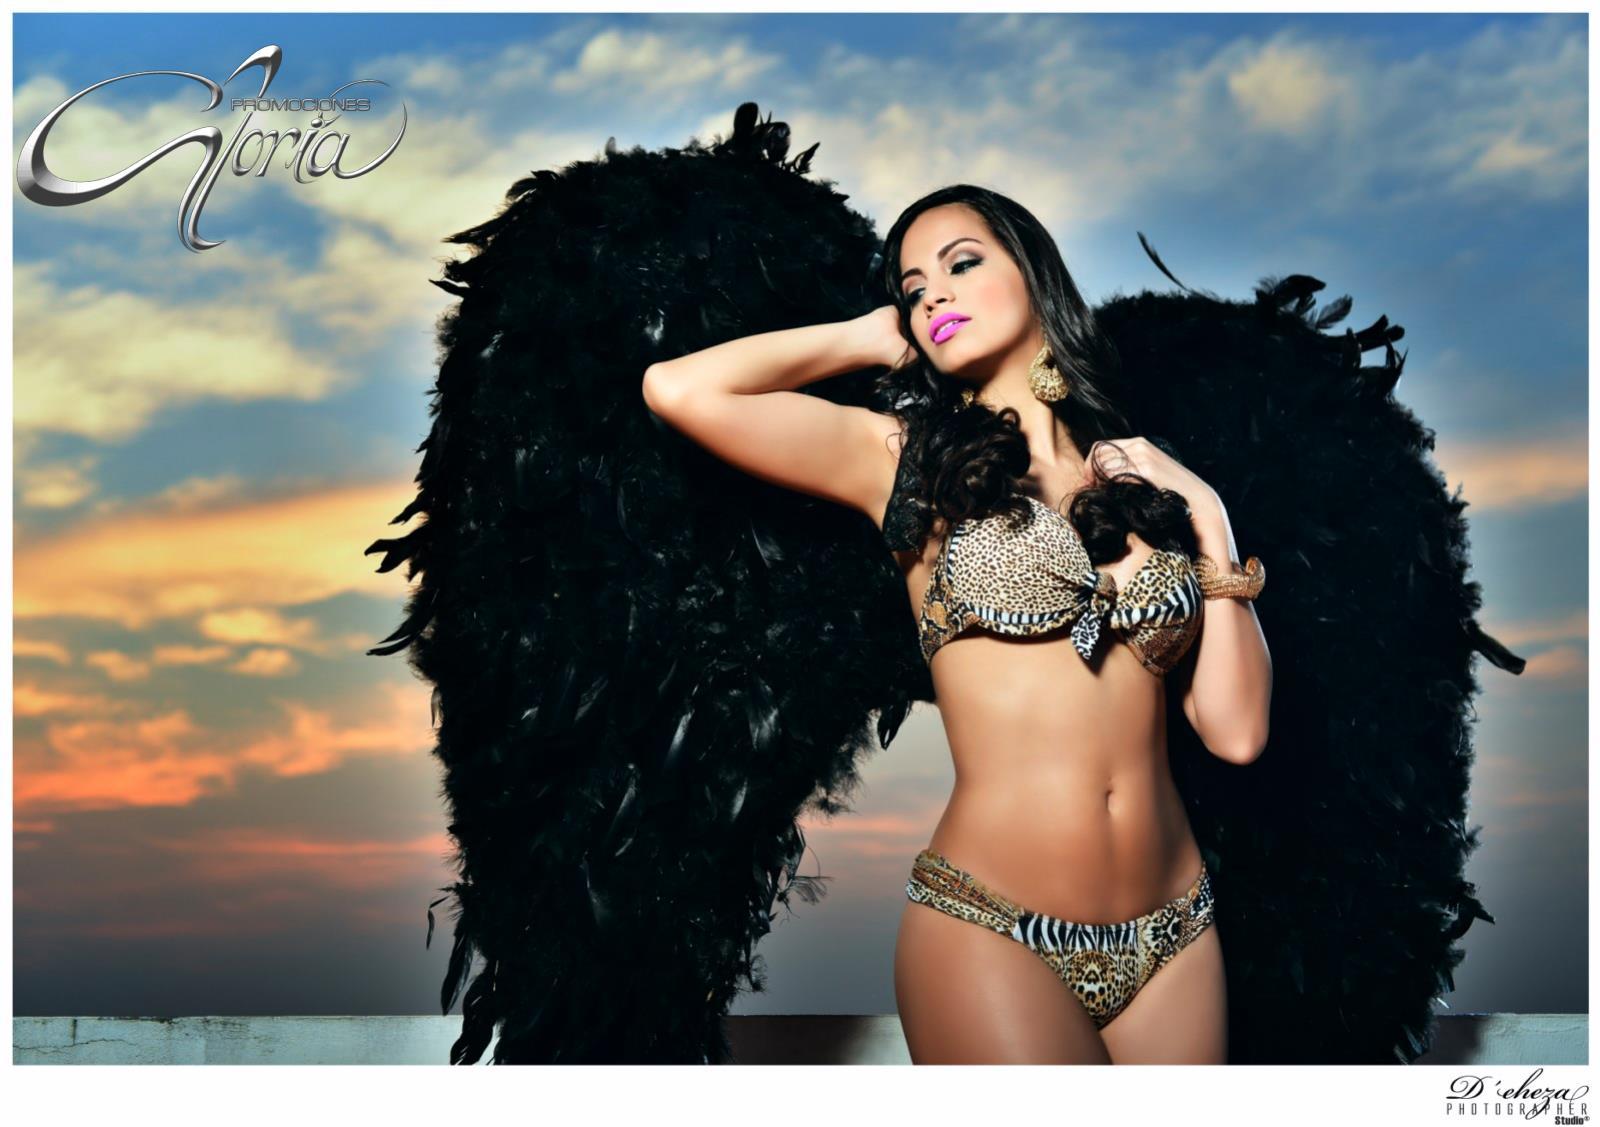 Erotica Maria Fernanda Padilla nudes (98 photos), Pussy, Hot, Twitter, lingerie 2019